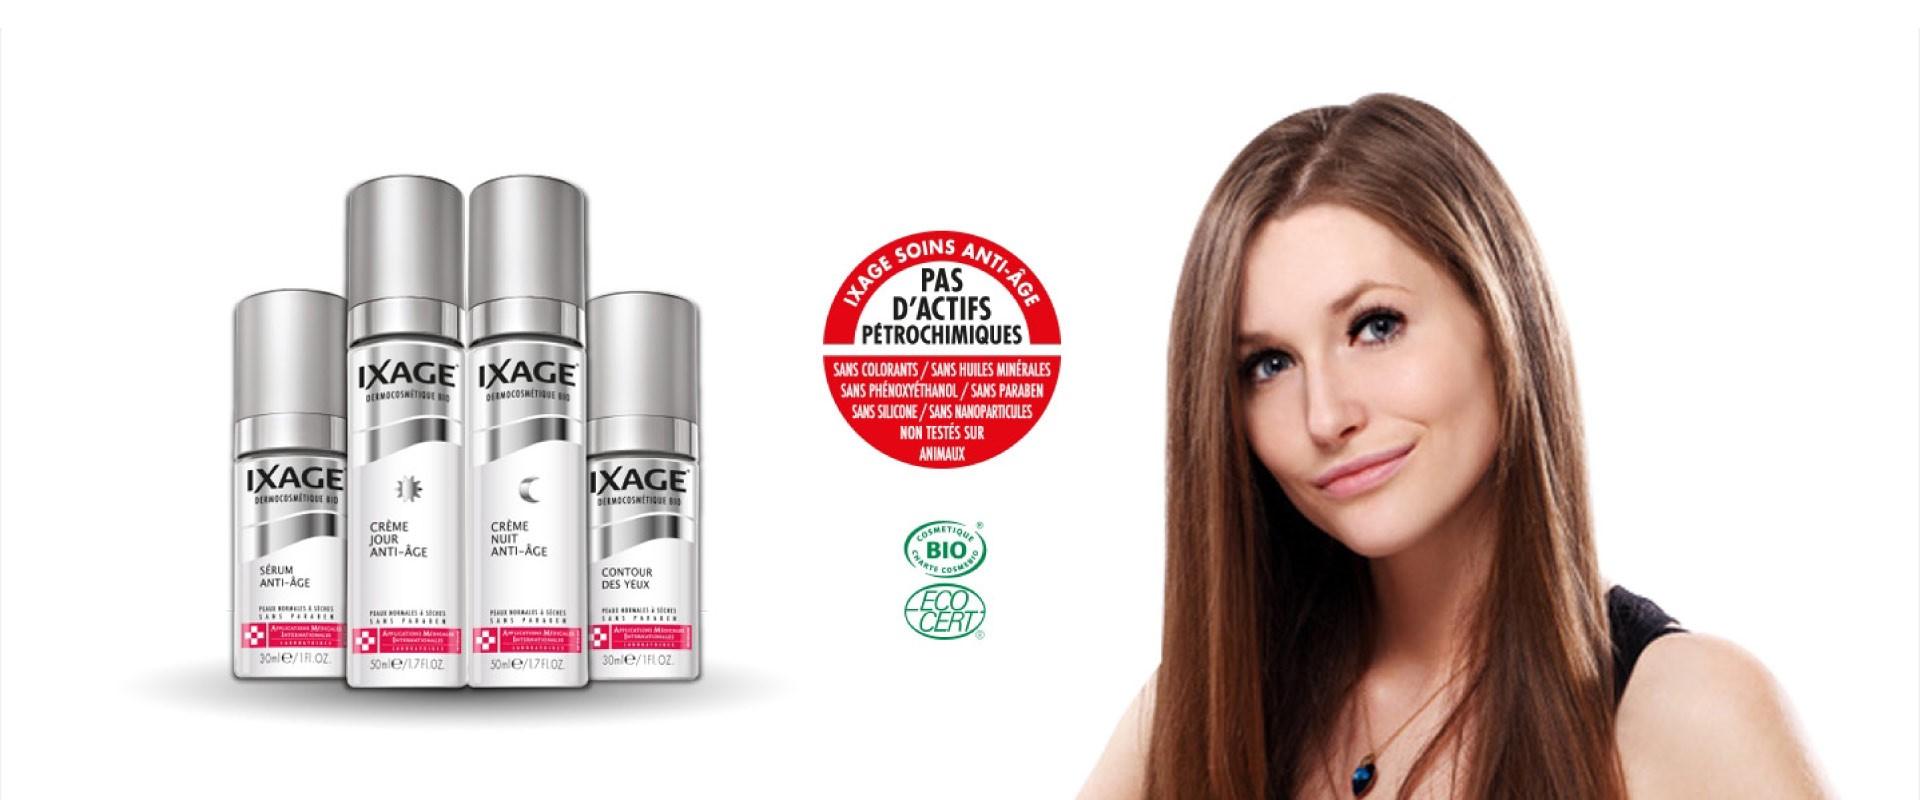 cosmetique-bio-ixage-Marconne-hesdin-Marconnelle-pharmacie-de-l-avenue